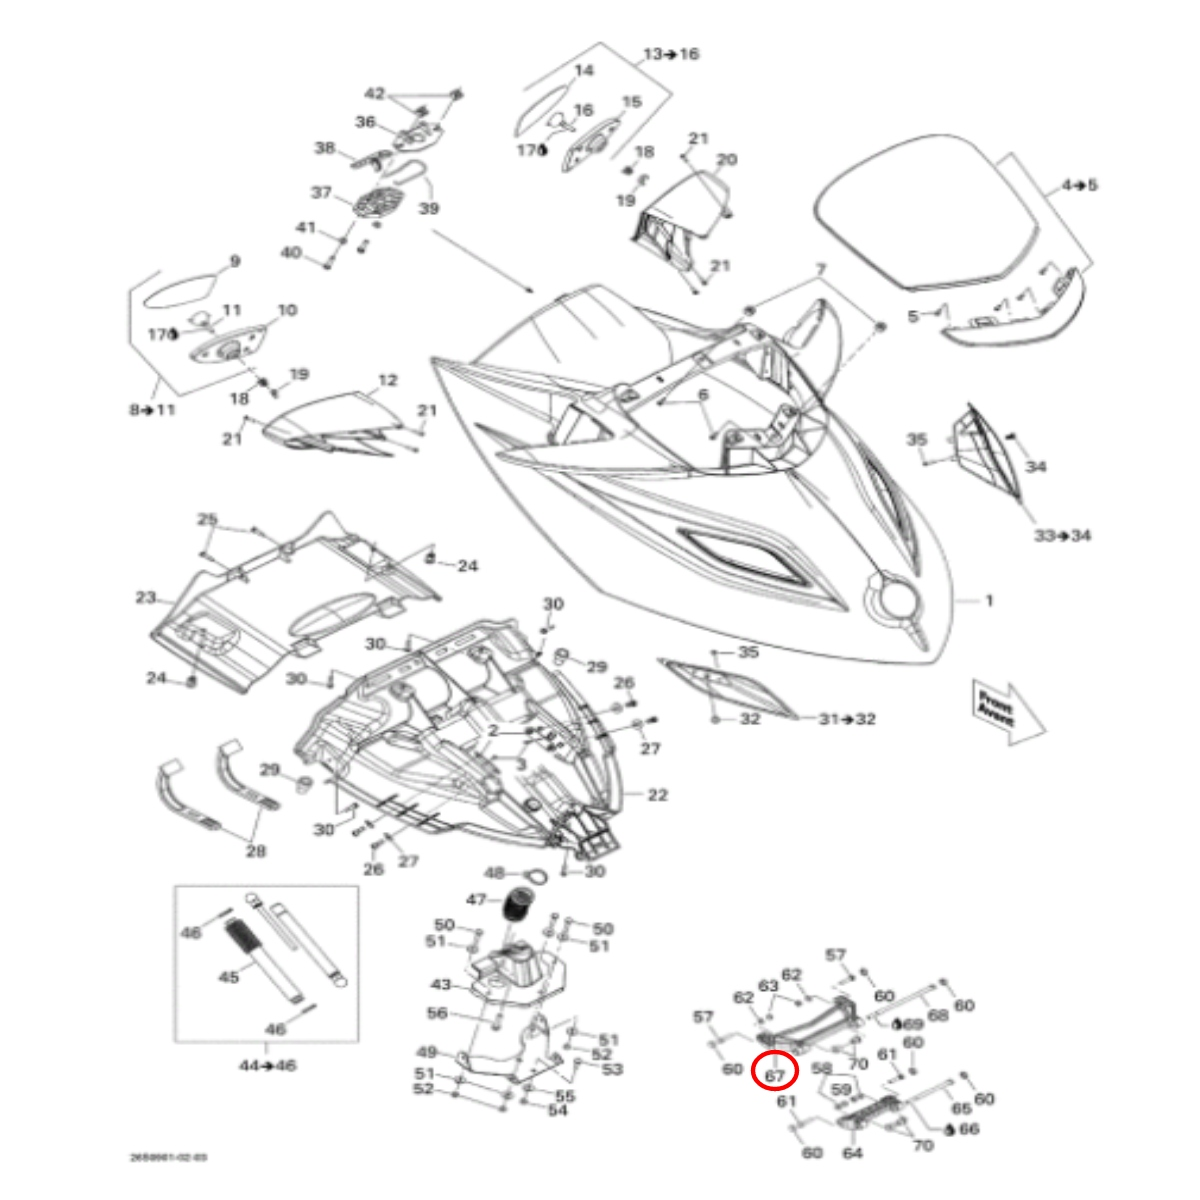 Dobradiça Tampa para Jet Ski Sea Doo GTX/RXT Grande  - Radical Peças - Peças para Jet Ski